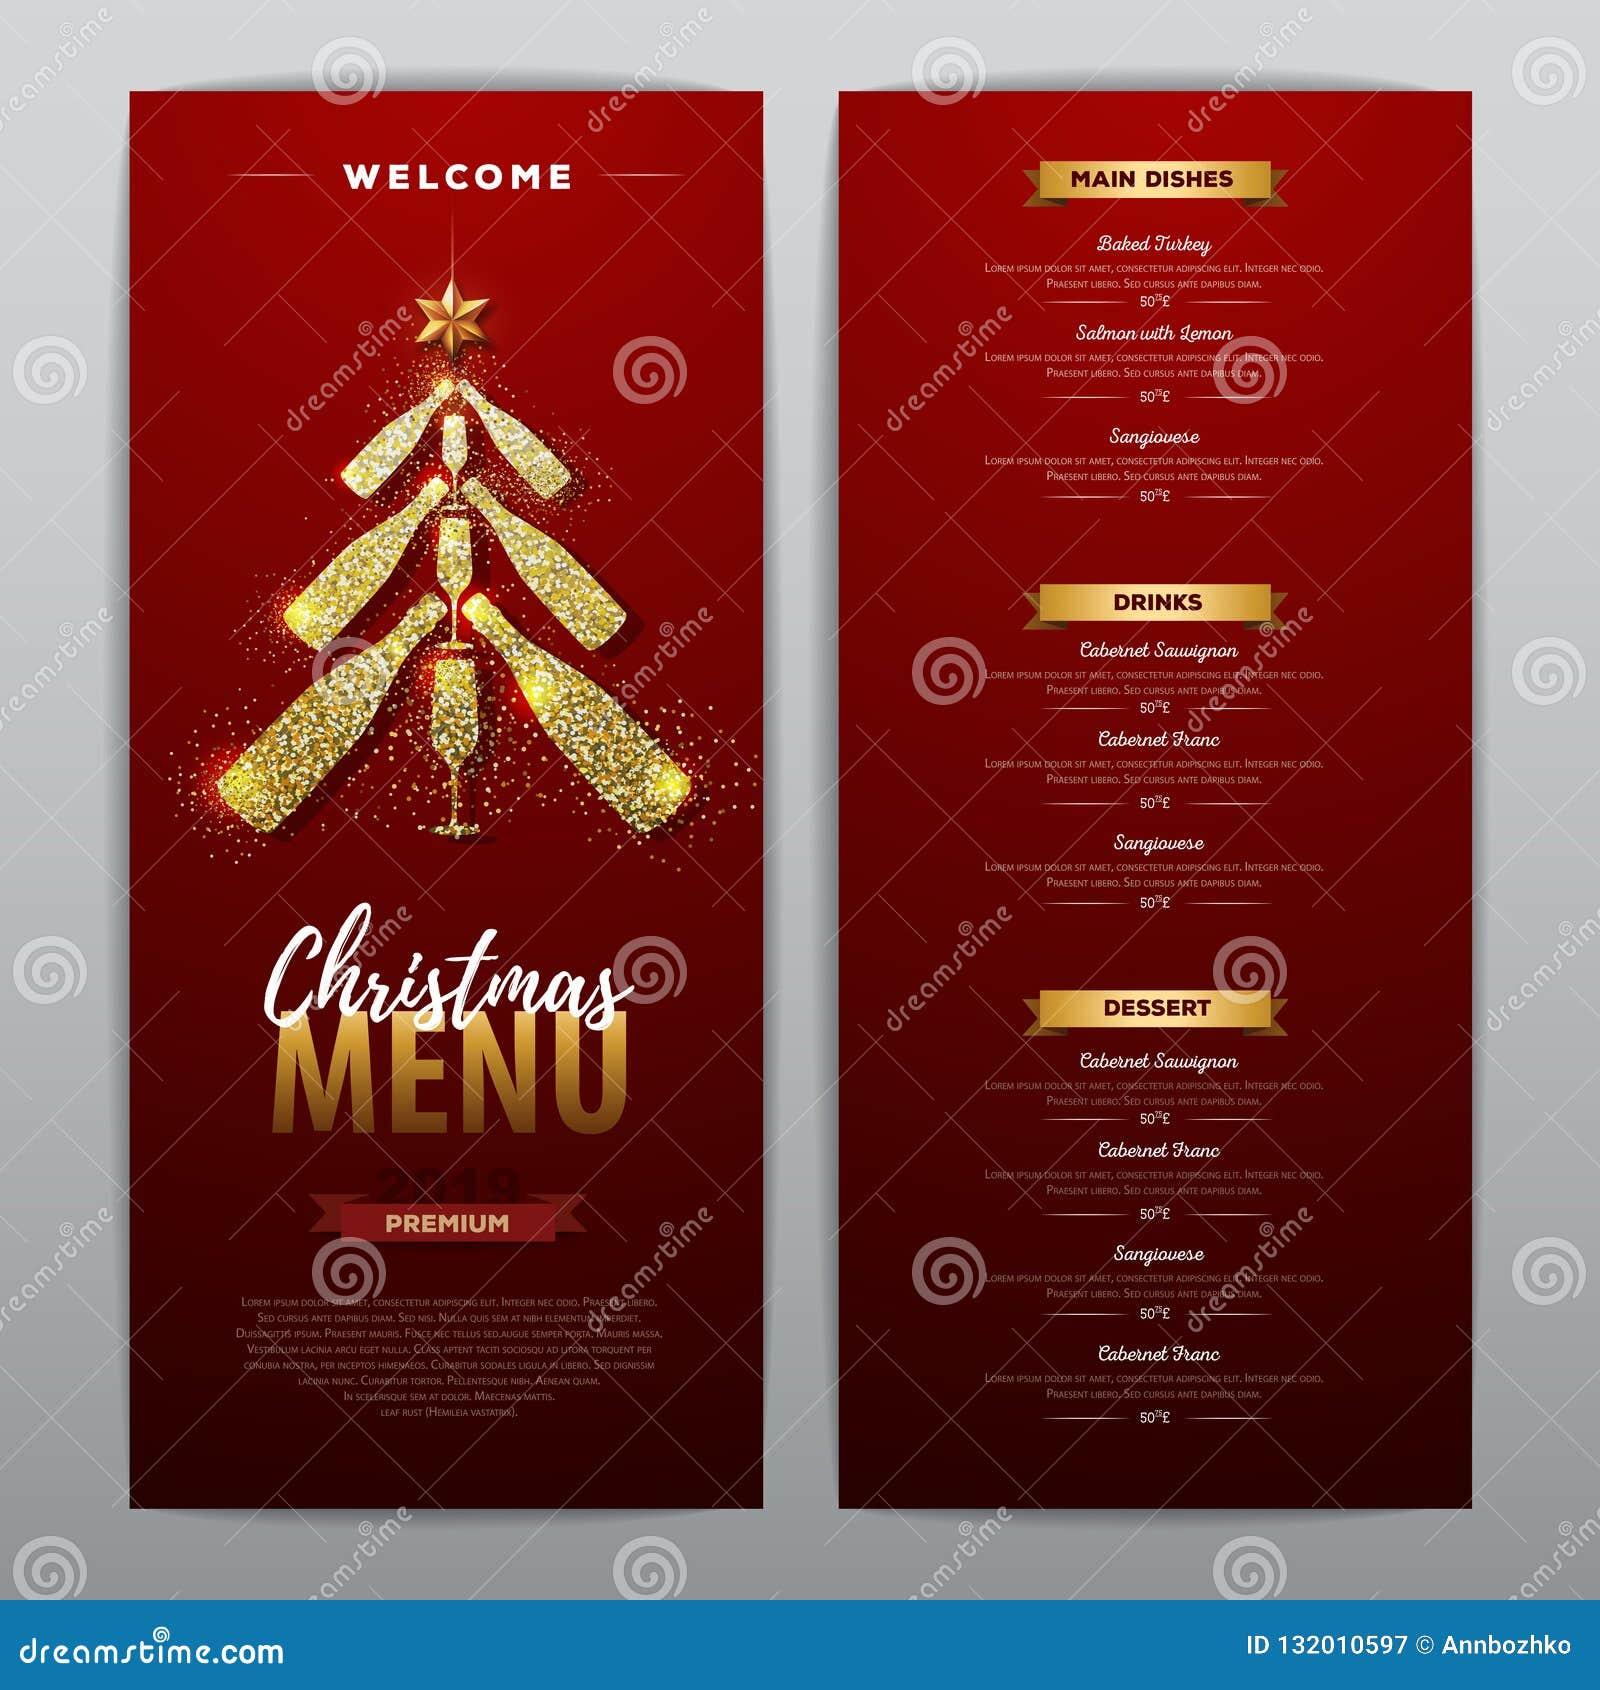 Christmas Restaurant Poster.Christmas Menu Design With Golden Champagne Bottles